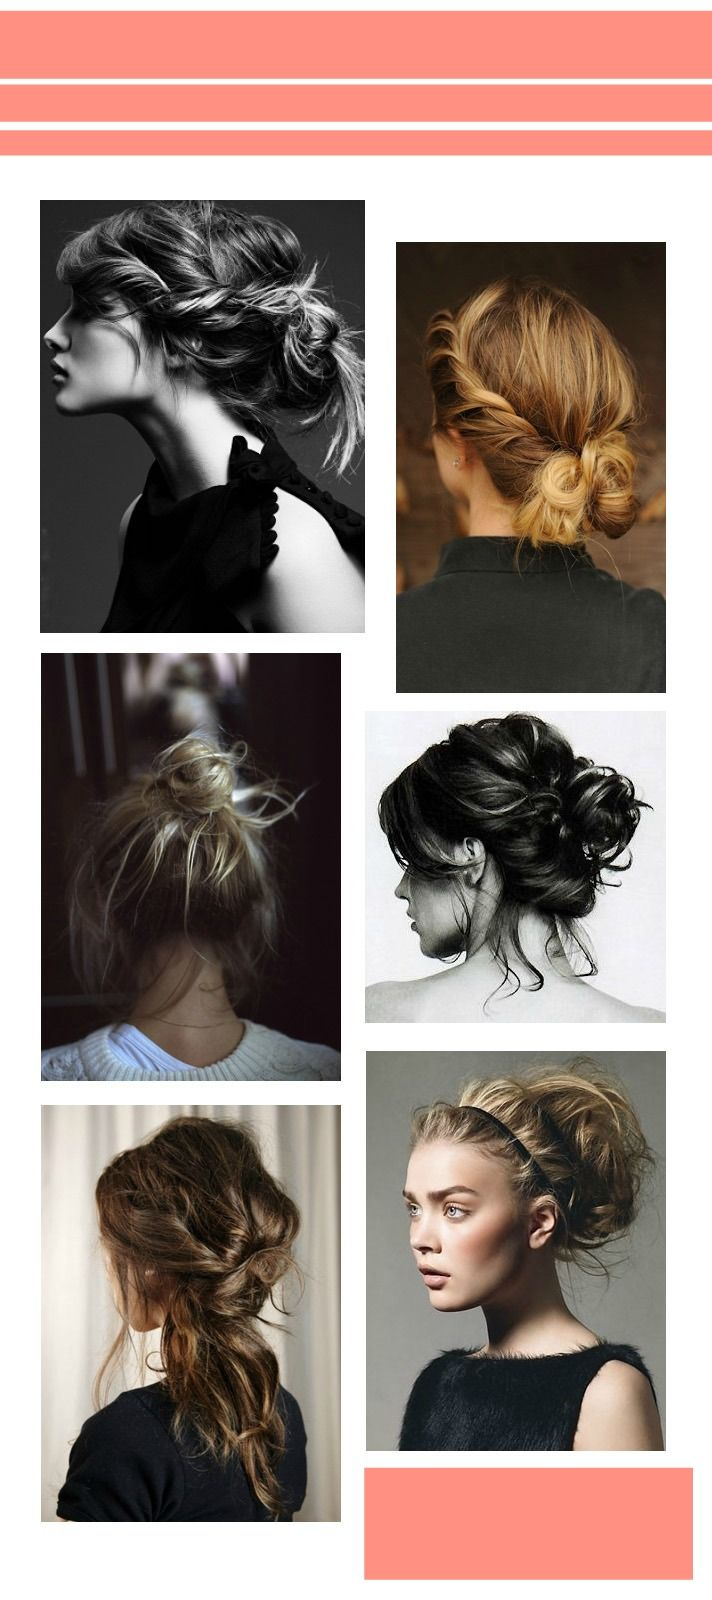 The Glossy Life: Romantic Undone Hair | Hair affair, Undone hair, Hair inspiration